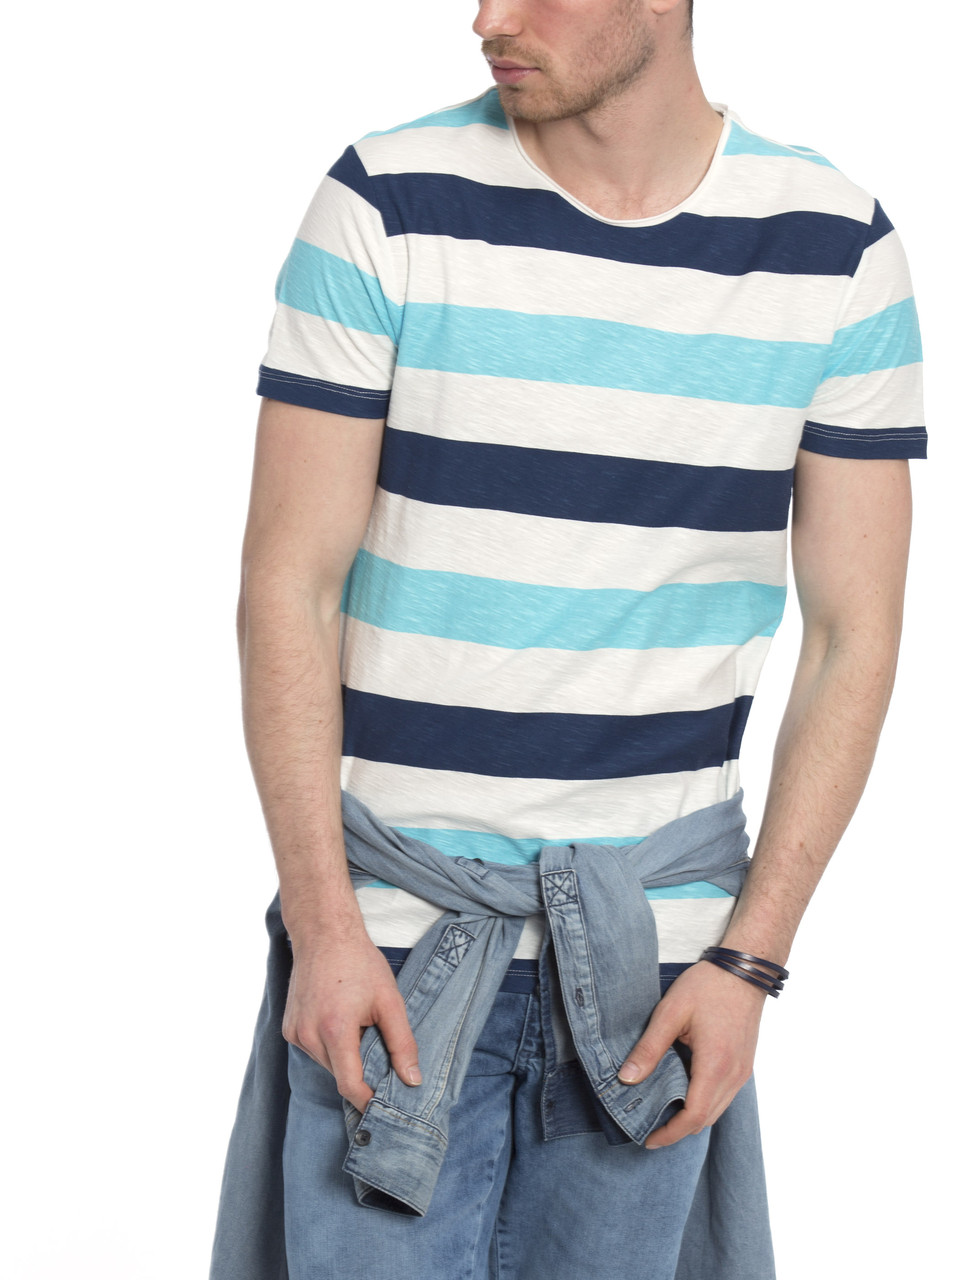 Белая мужская футболка Lc Waikiki / Лс Вайкики в сине-голубую полоску